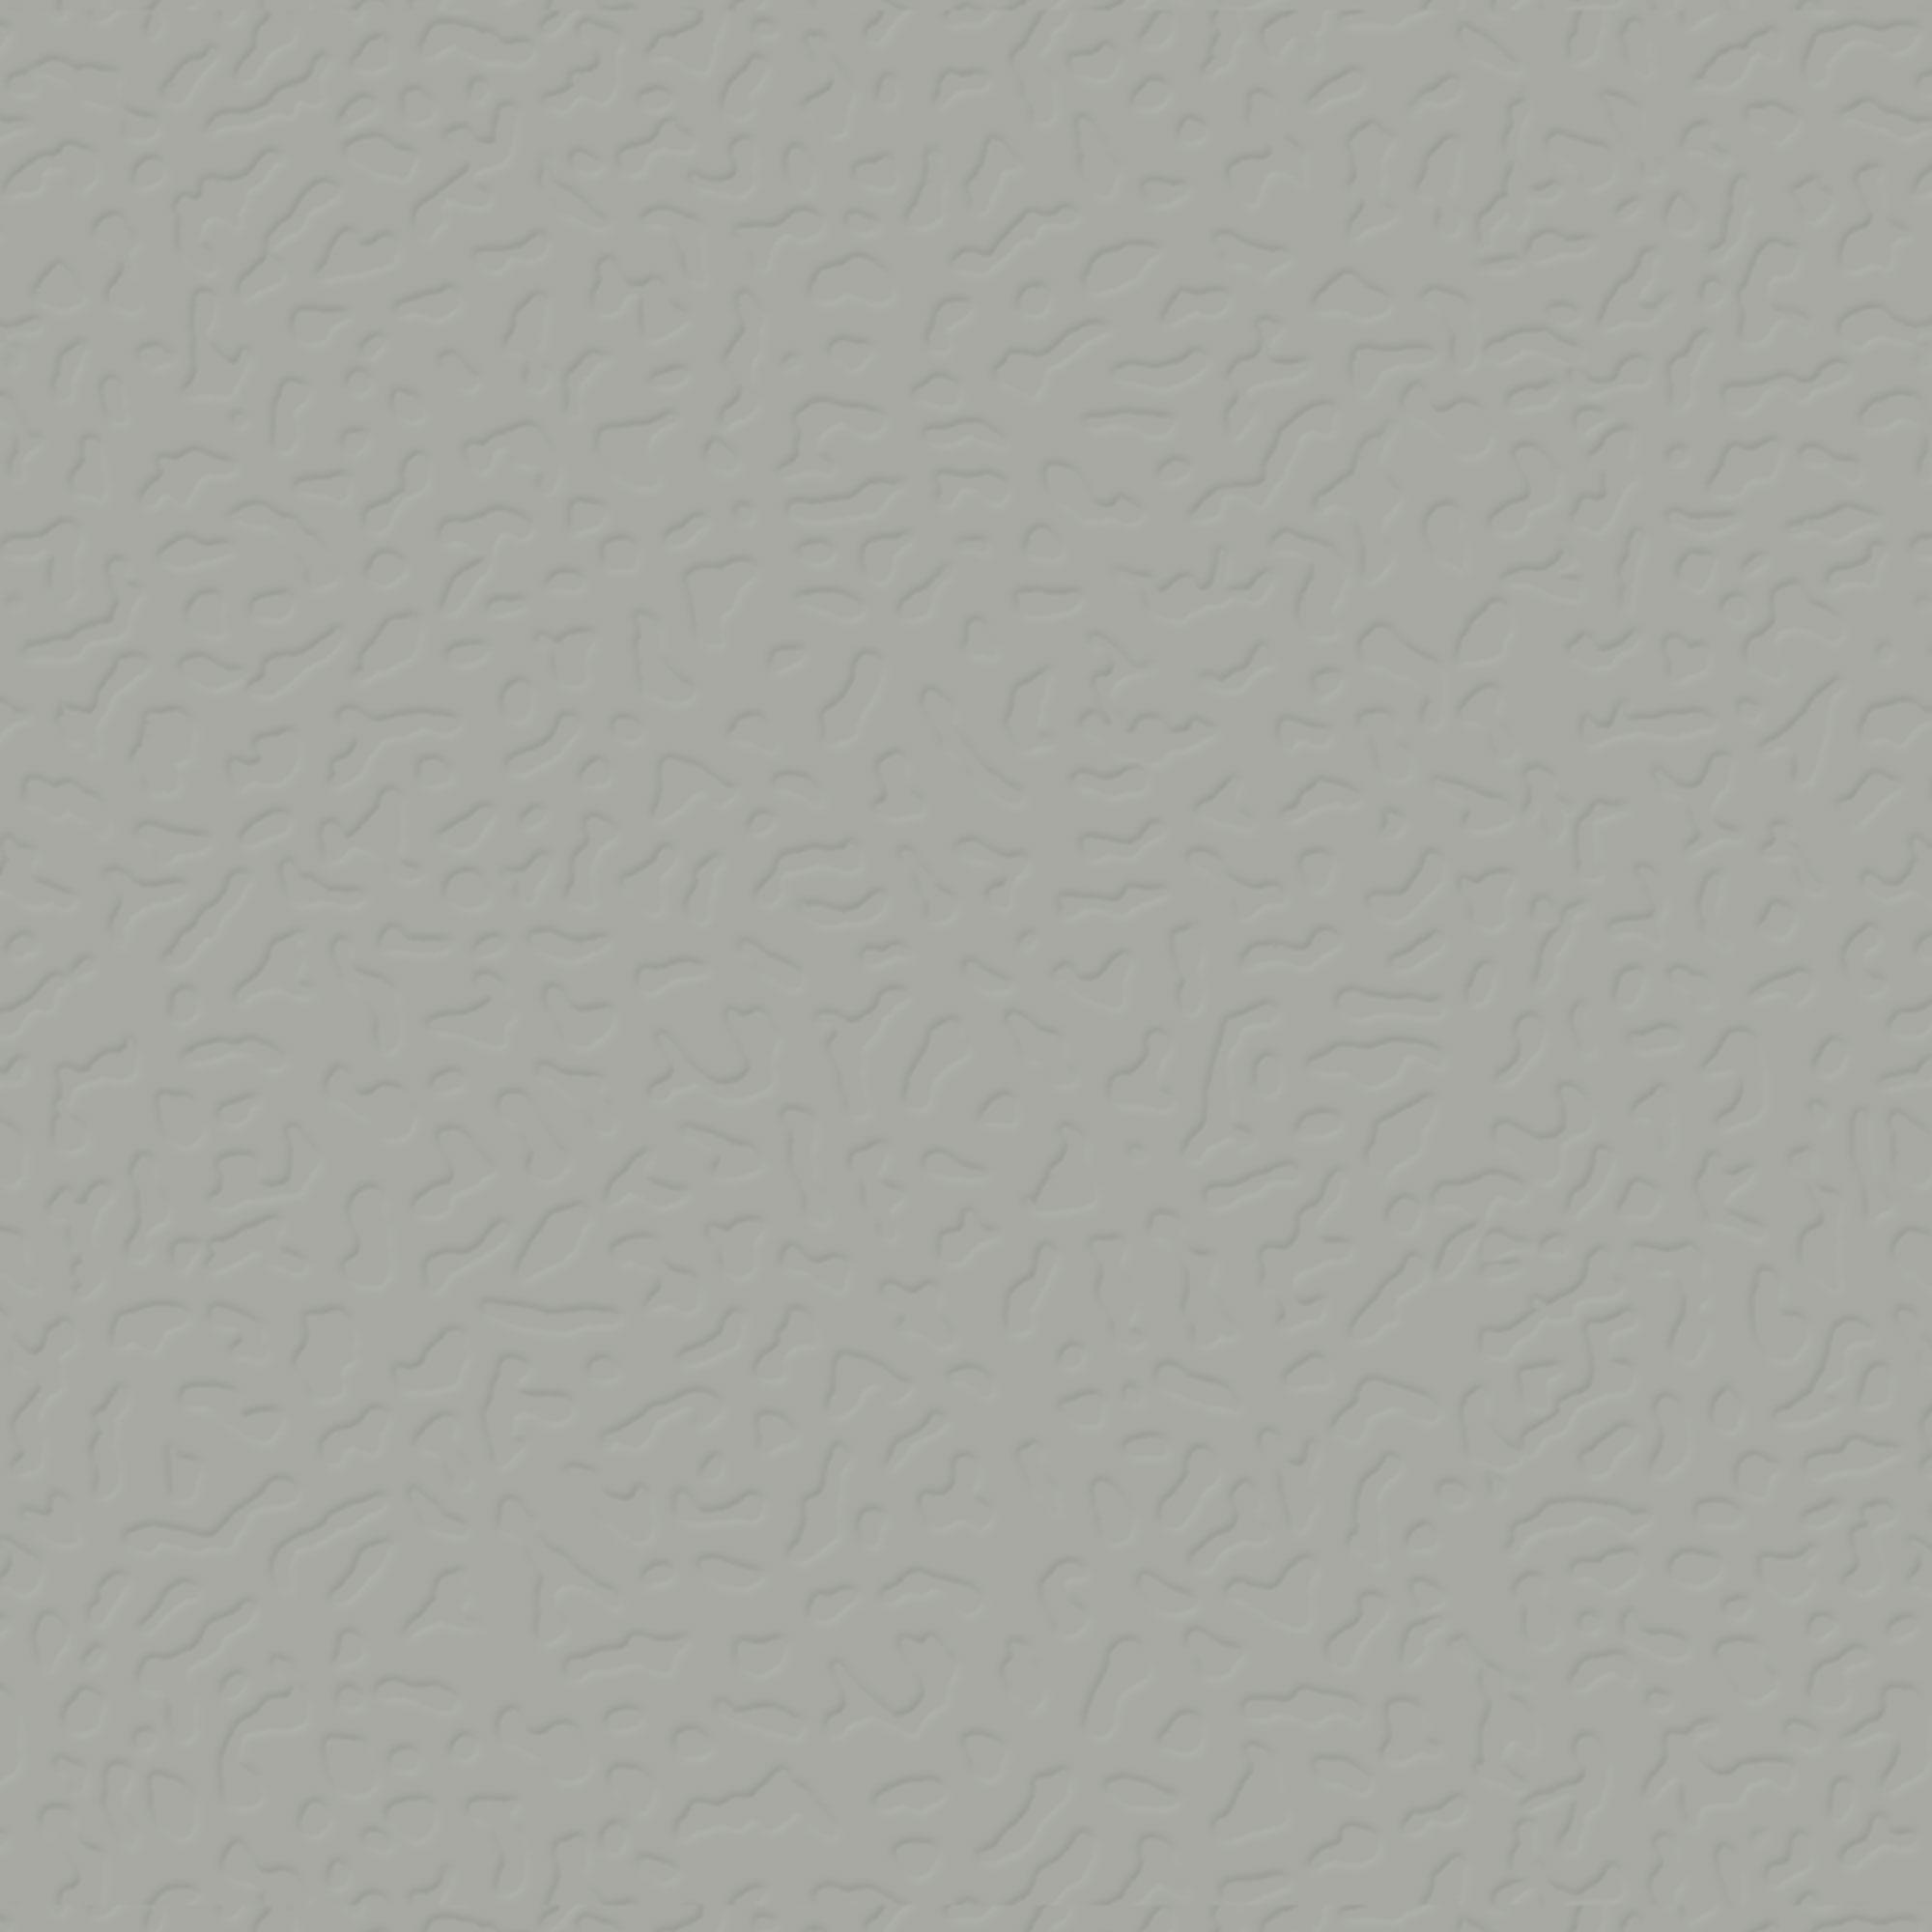 Roppe Rubber Tile 900 - Hammered Design (995) Light Gray Rubber Flooring